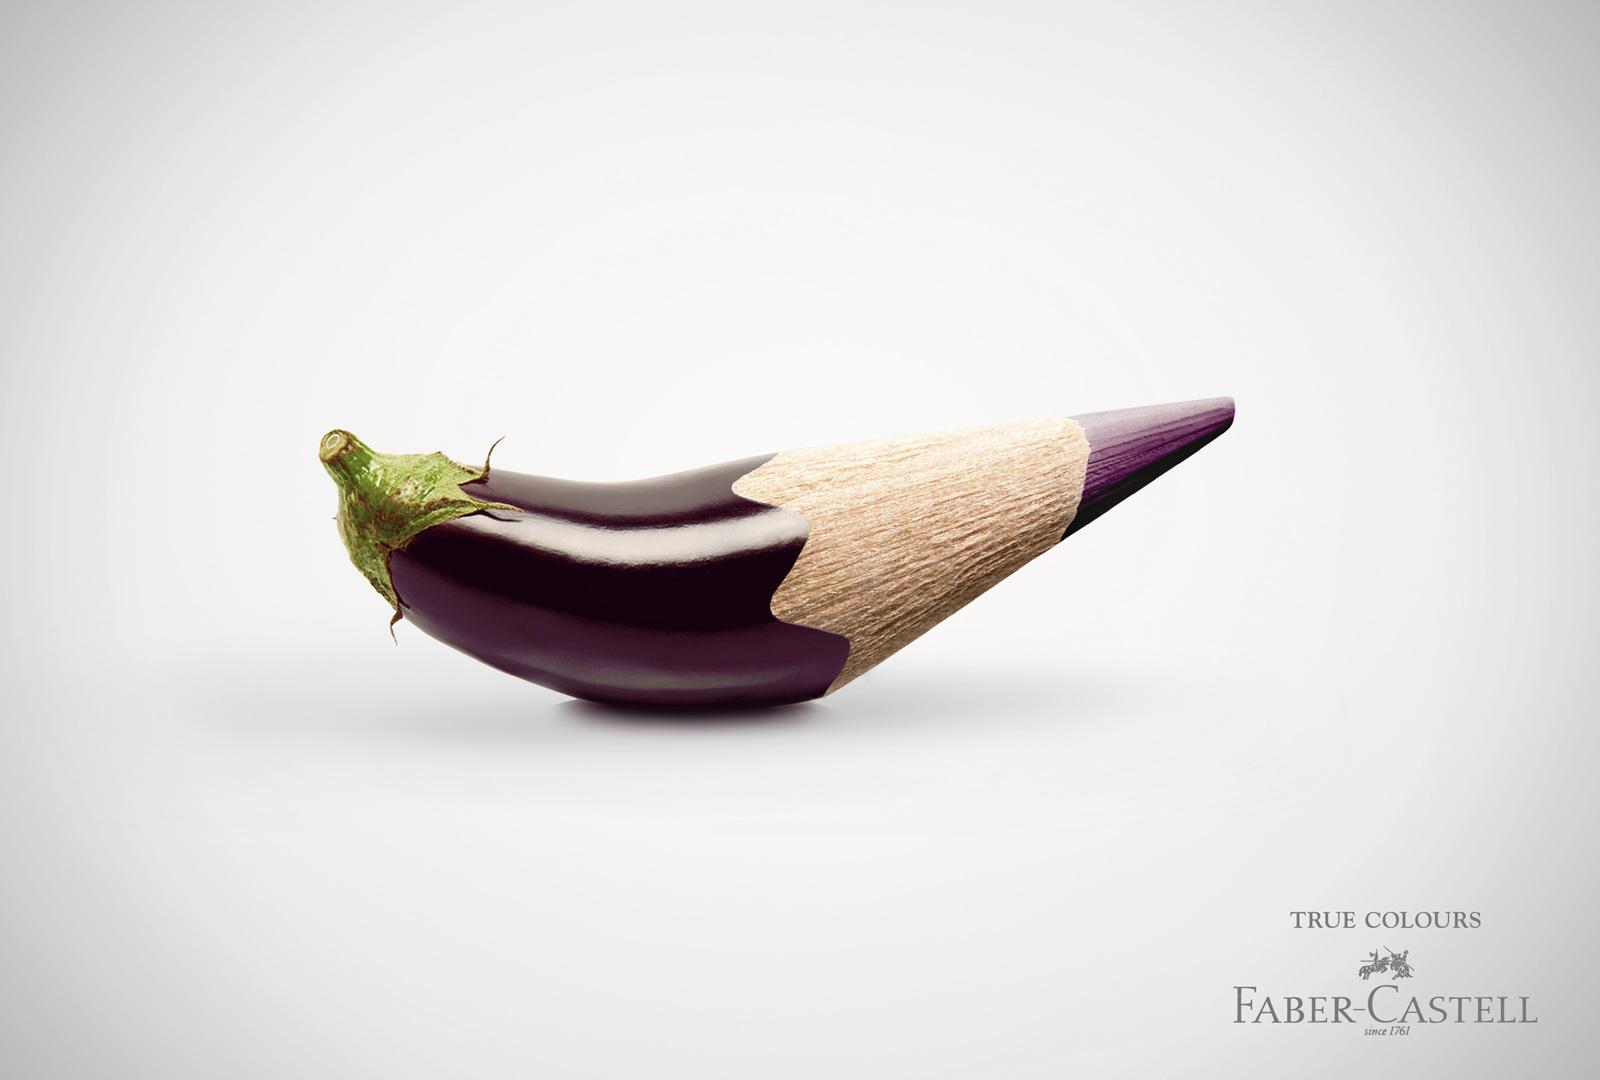 fabercastell-reklam-tasarimlari